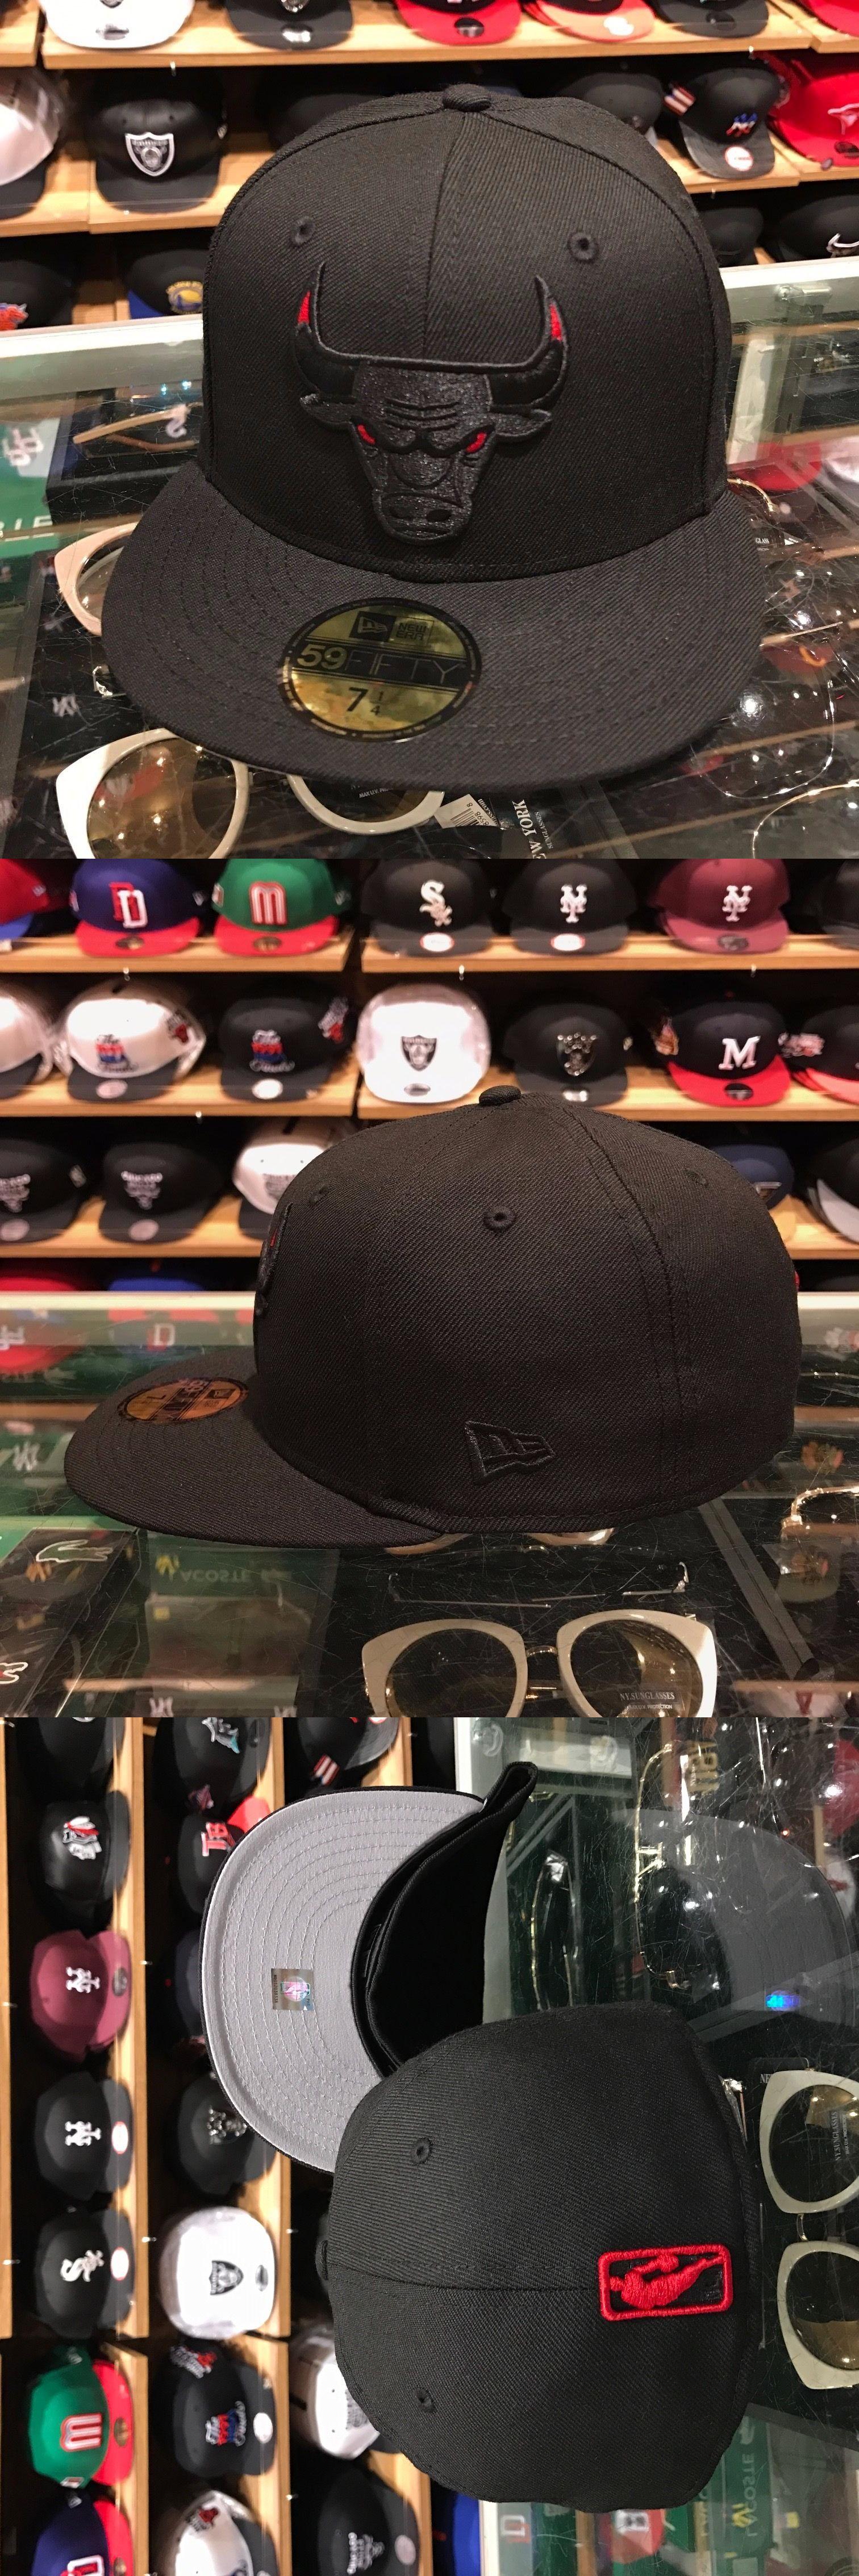 9e7e3856147 ... coupon code for hats 52365 new era chicago bulls fitted hat black red  eye regular logo